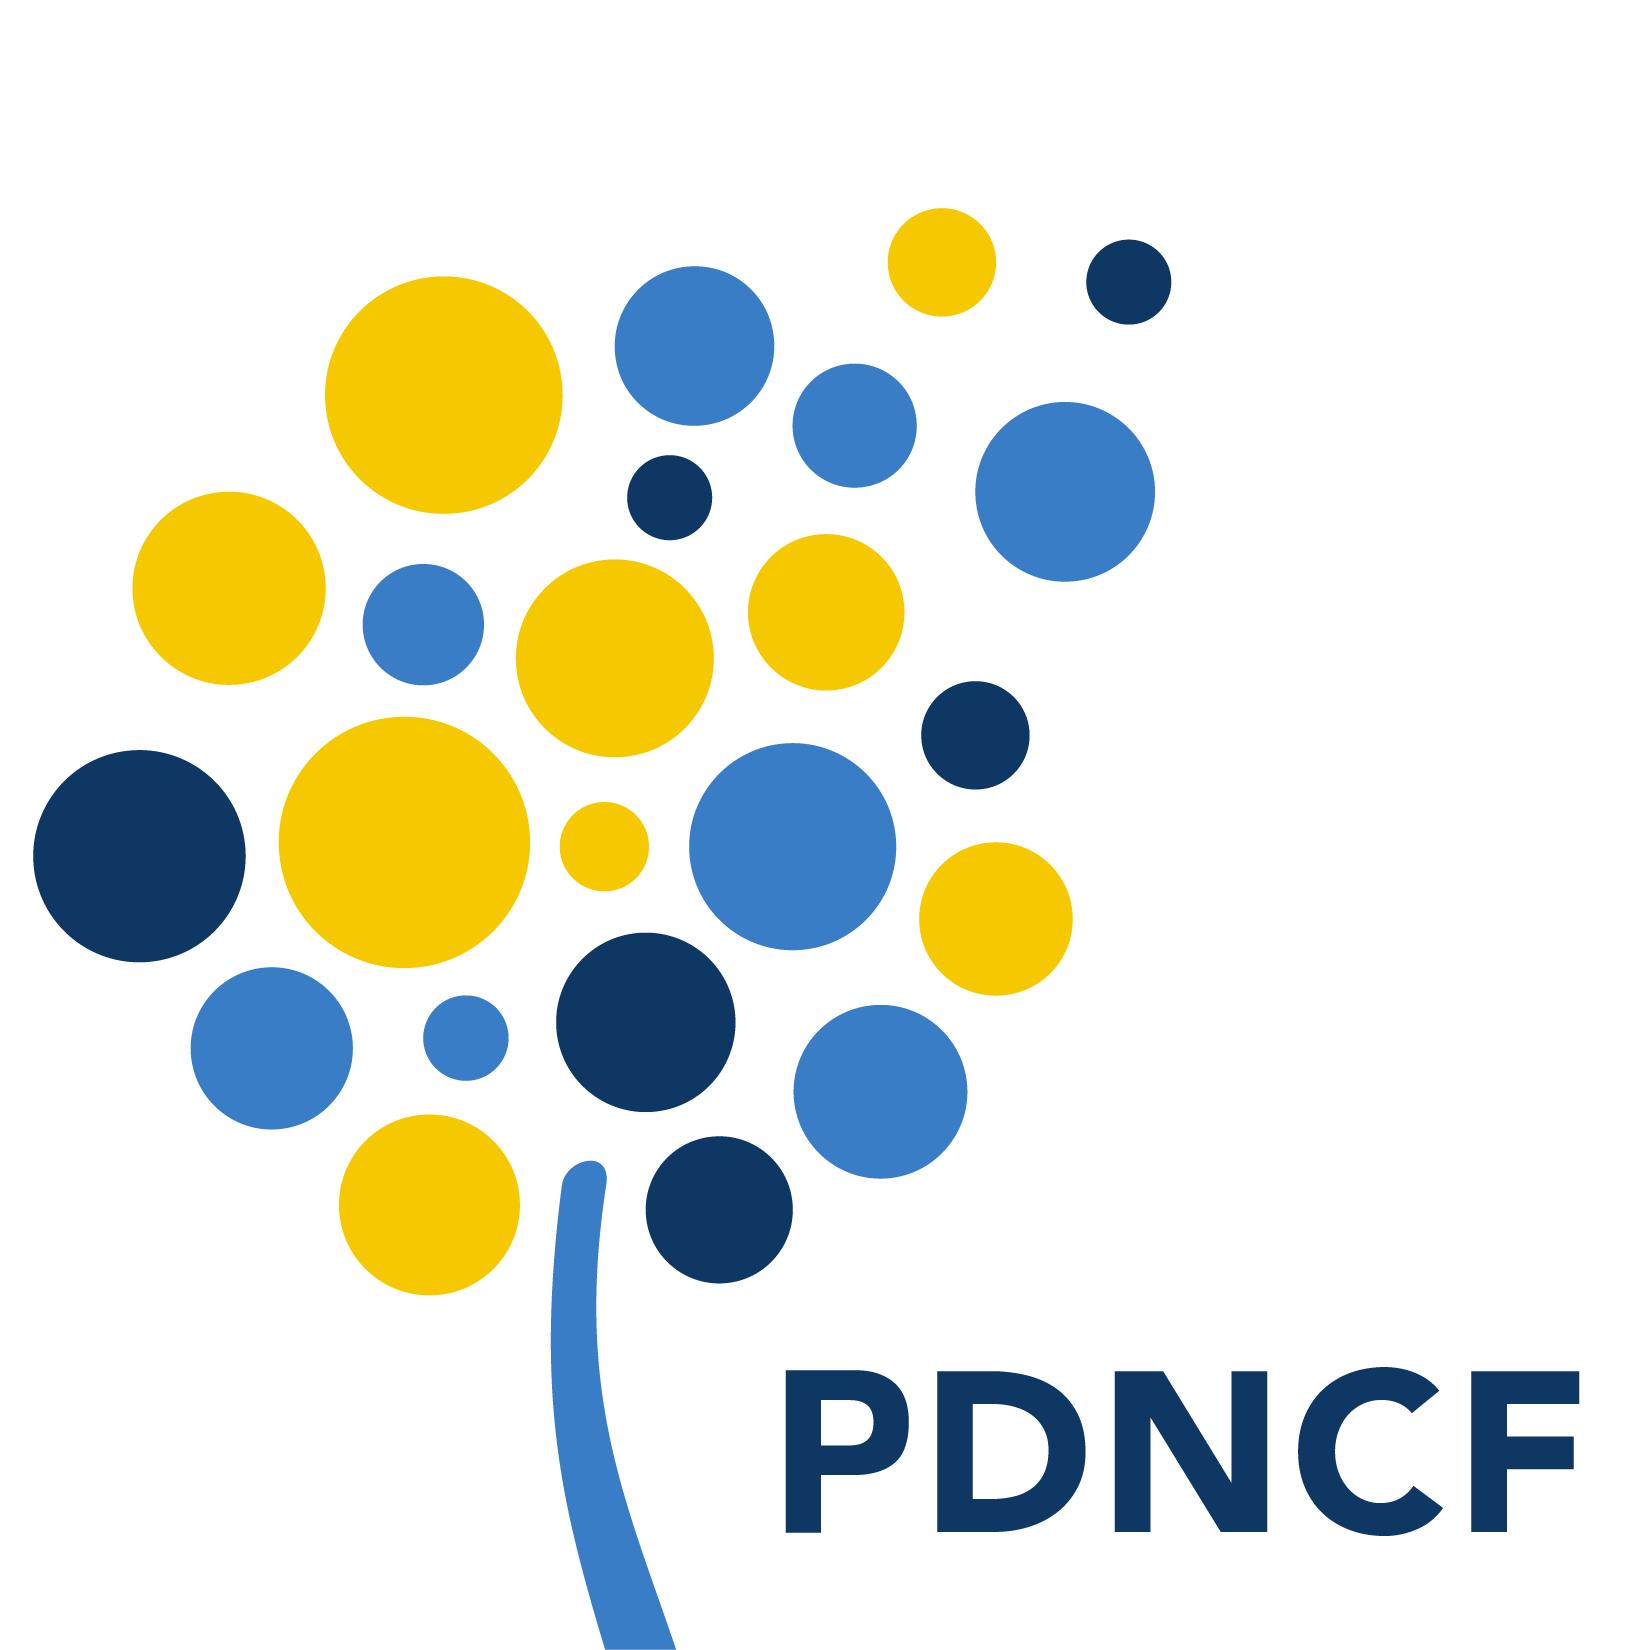 pdncf.png